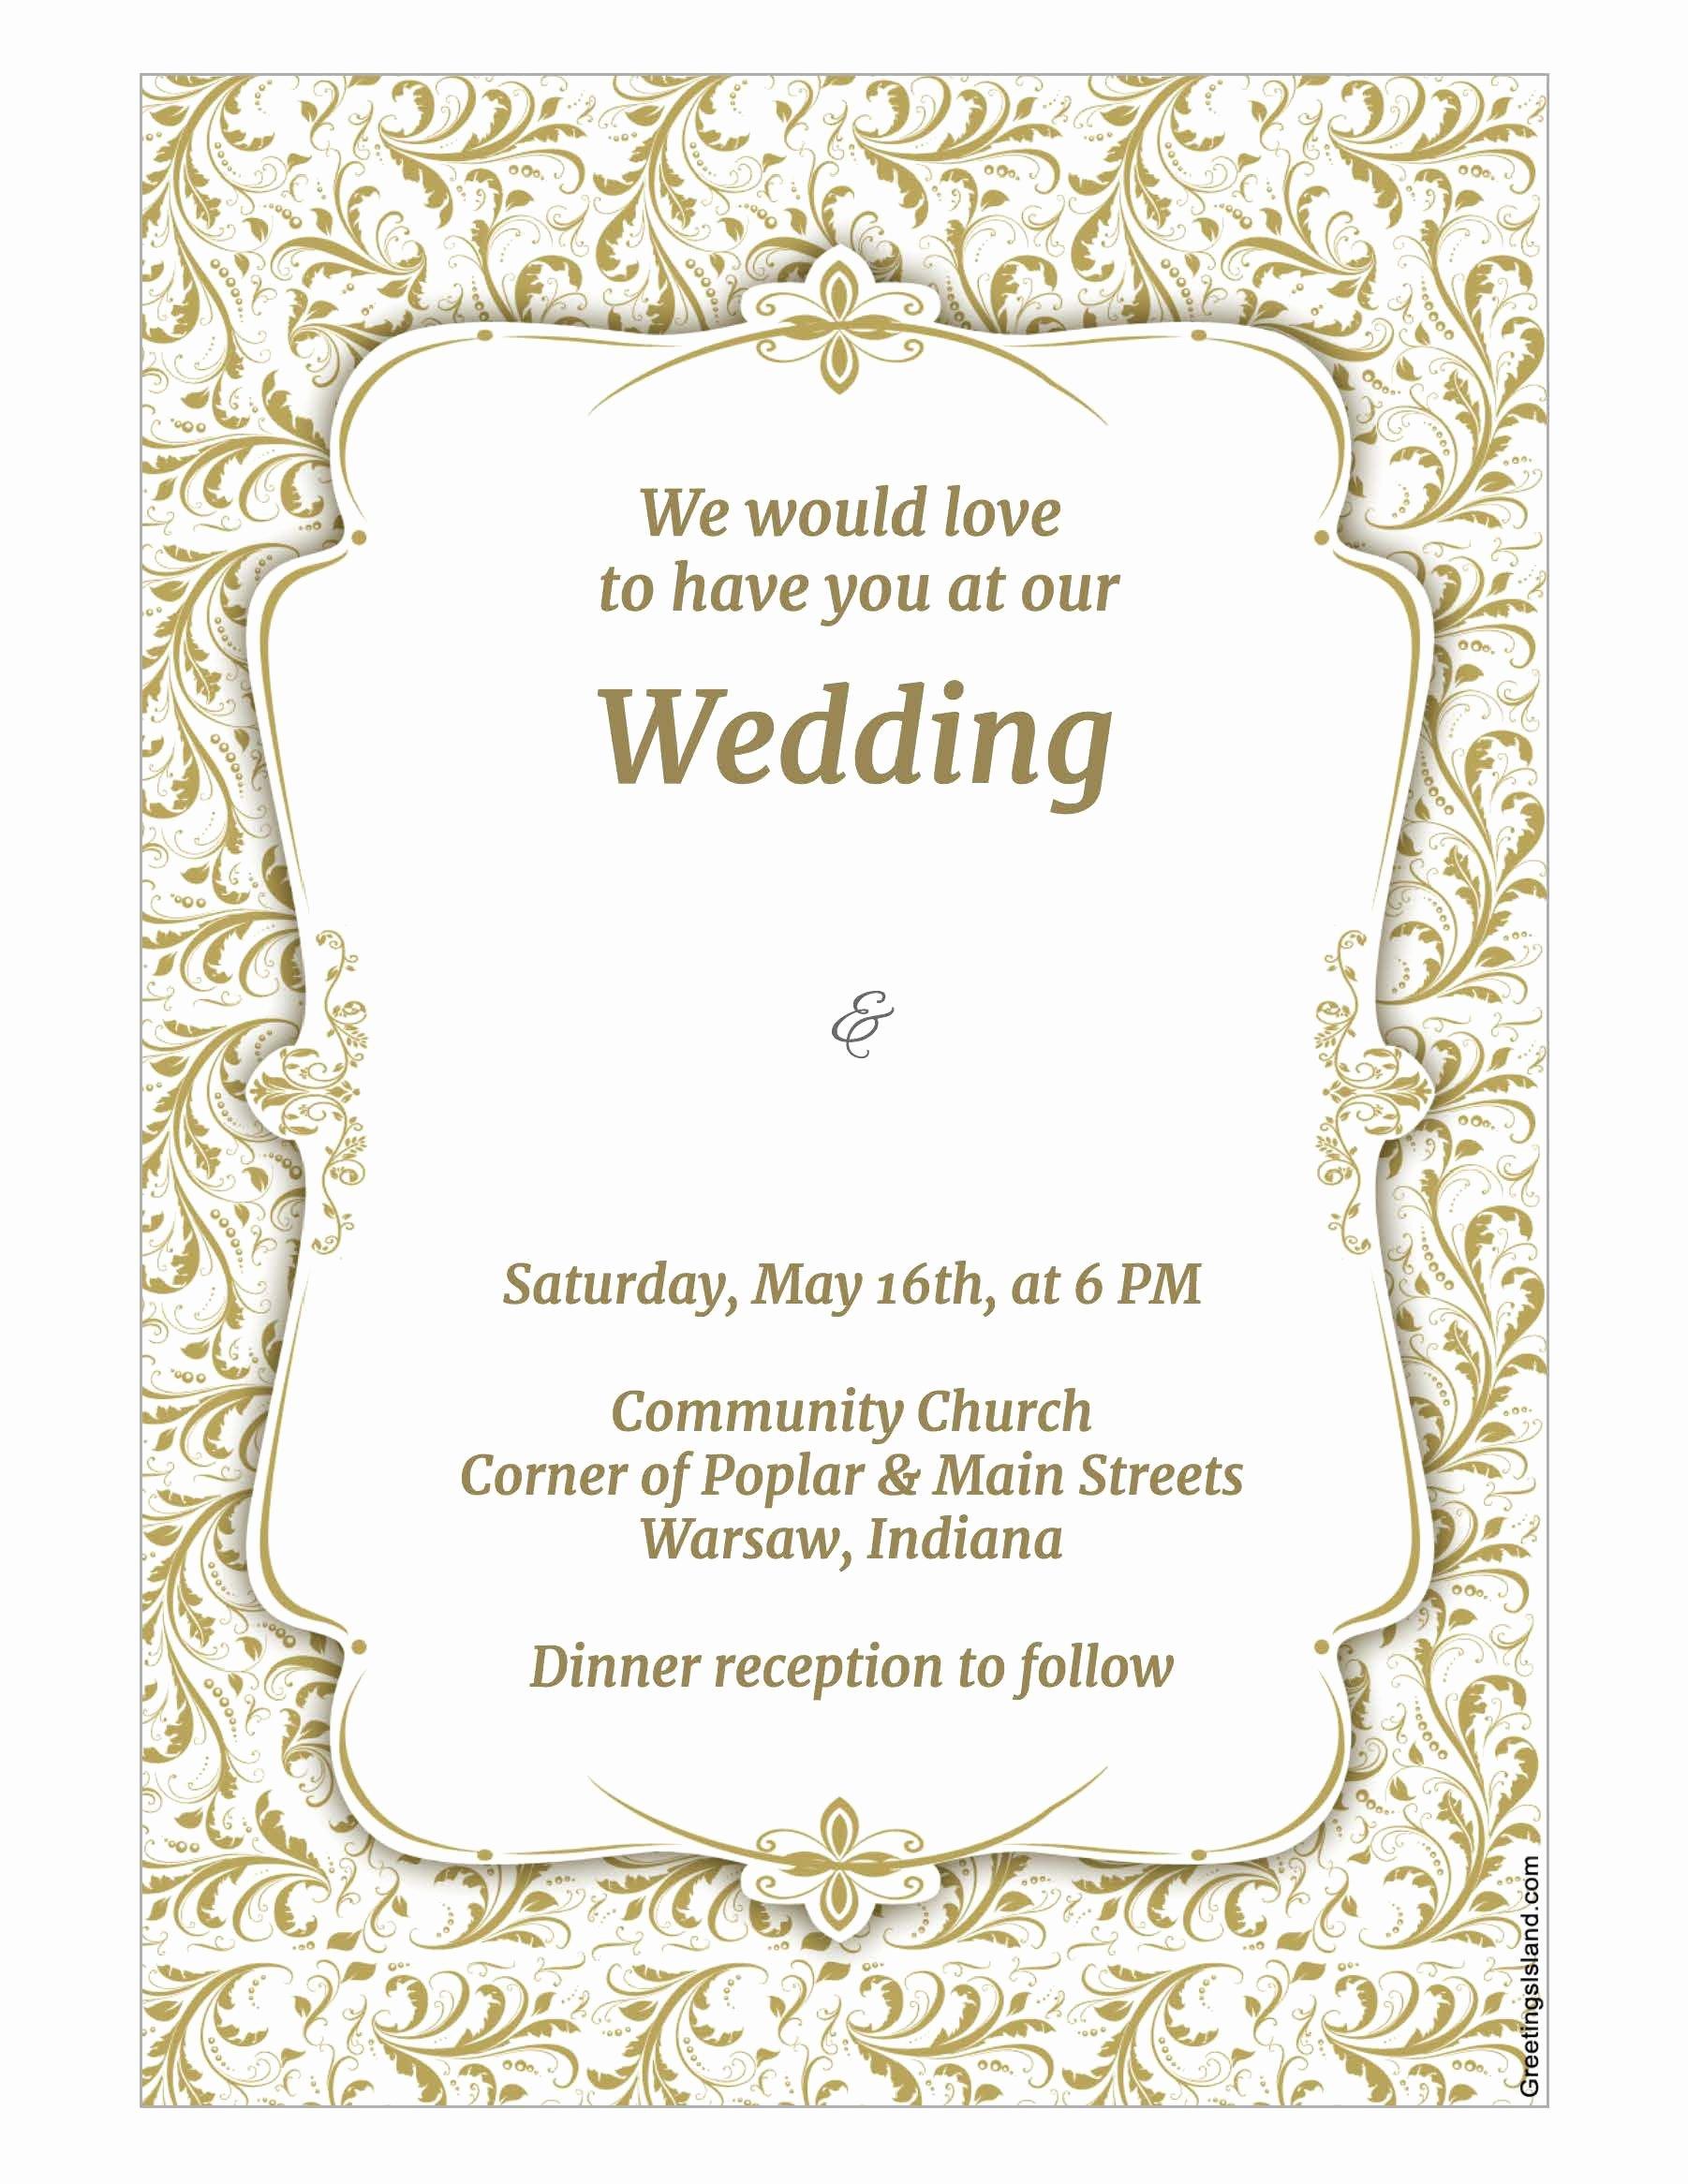 Wedding Invitations Photoshop Template Unique Wedding Invitation Template Wedding Invitation Template